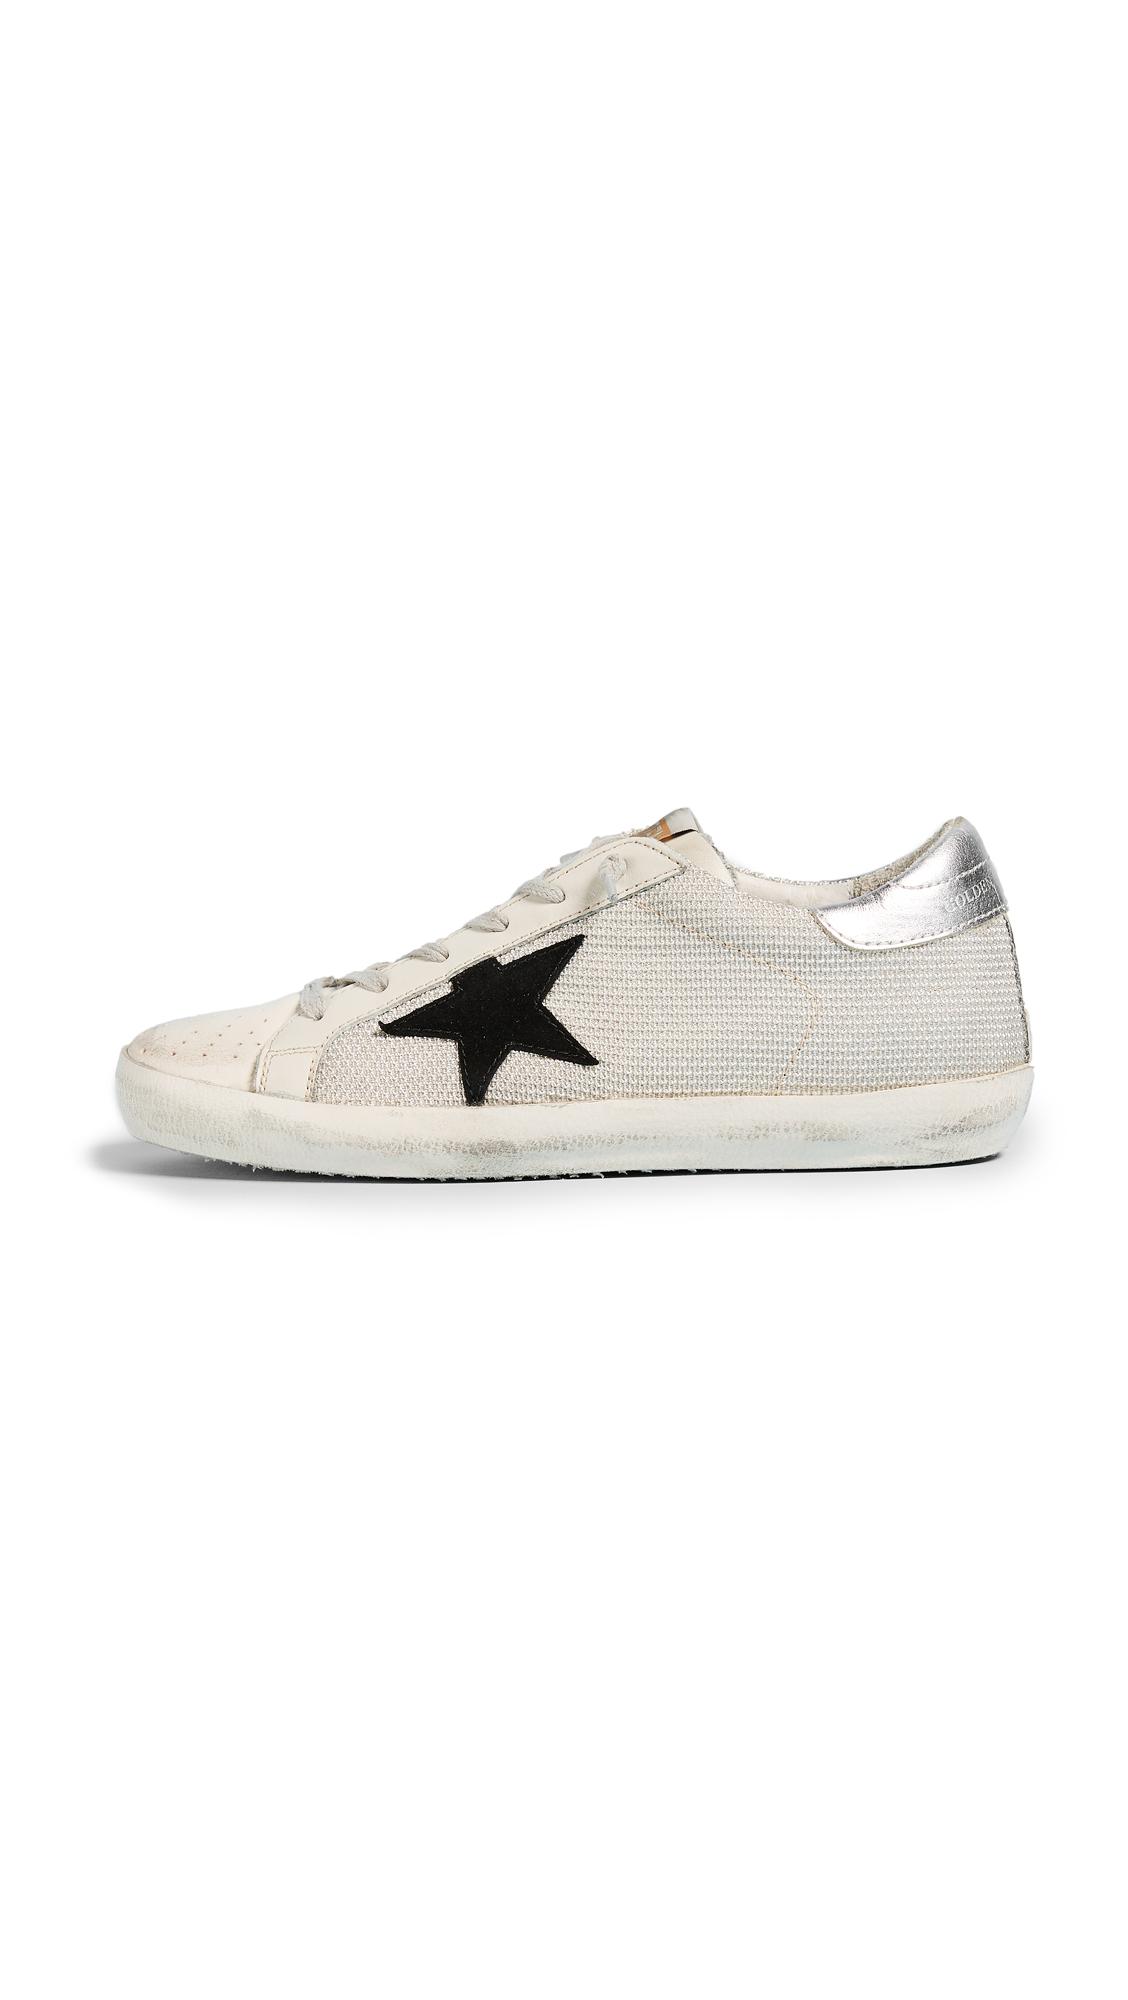 Golden Goose Superstar Sneakers - White Cord/Silver Lurex